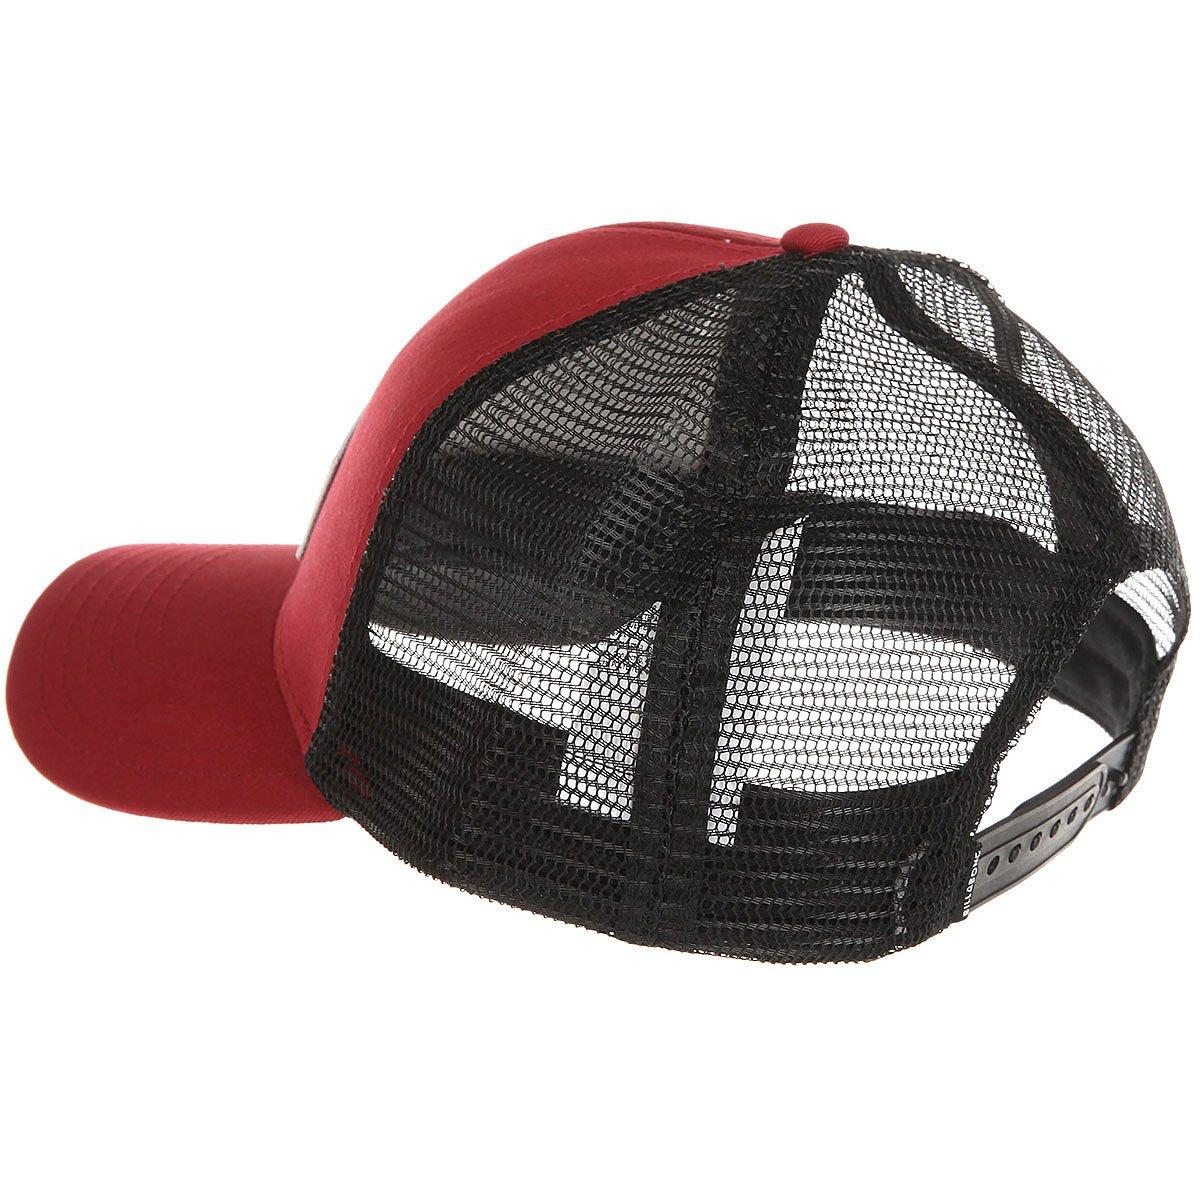 0d56261debc Купить бейсболку с сеткой Billabong Wharf Trucker Red Clay в ...